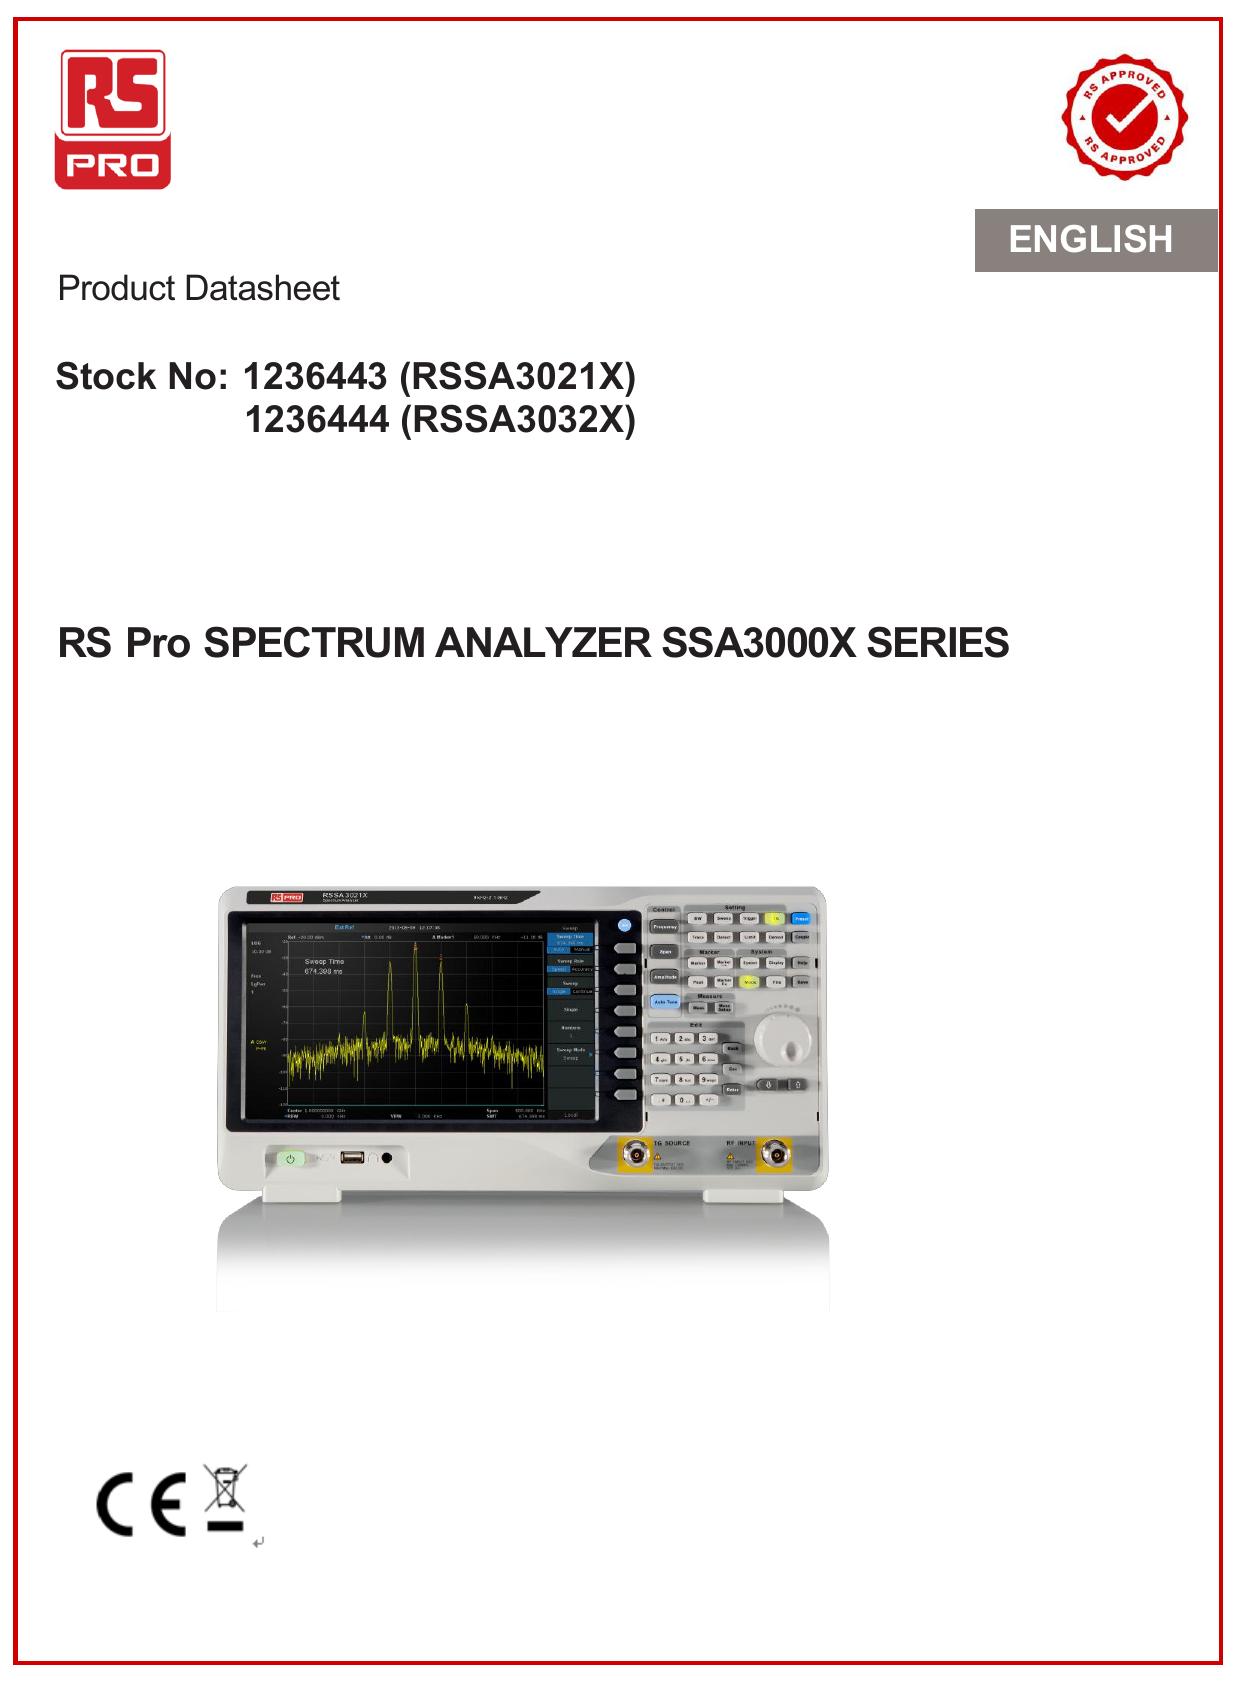 RS Pro SPECTRUM ANALYZER SSA3000X SERIES   manualzz com